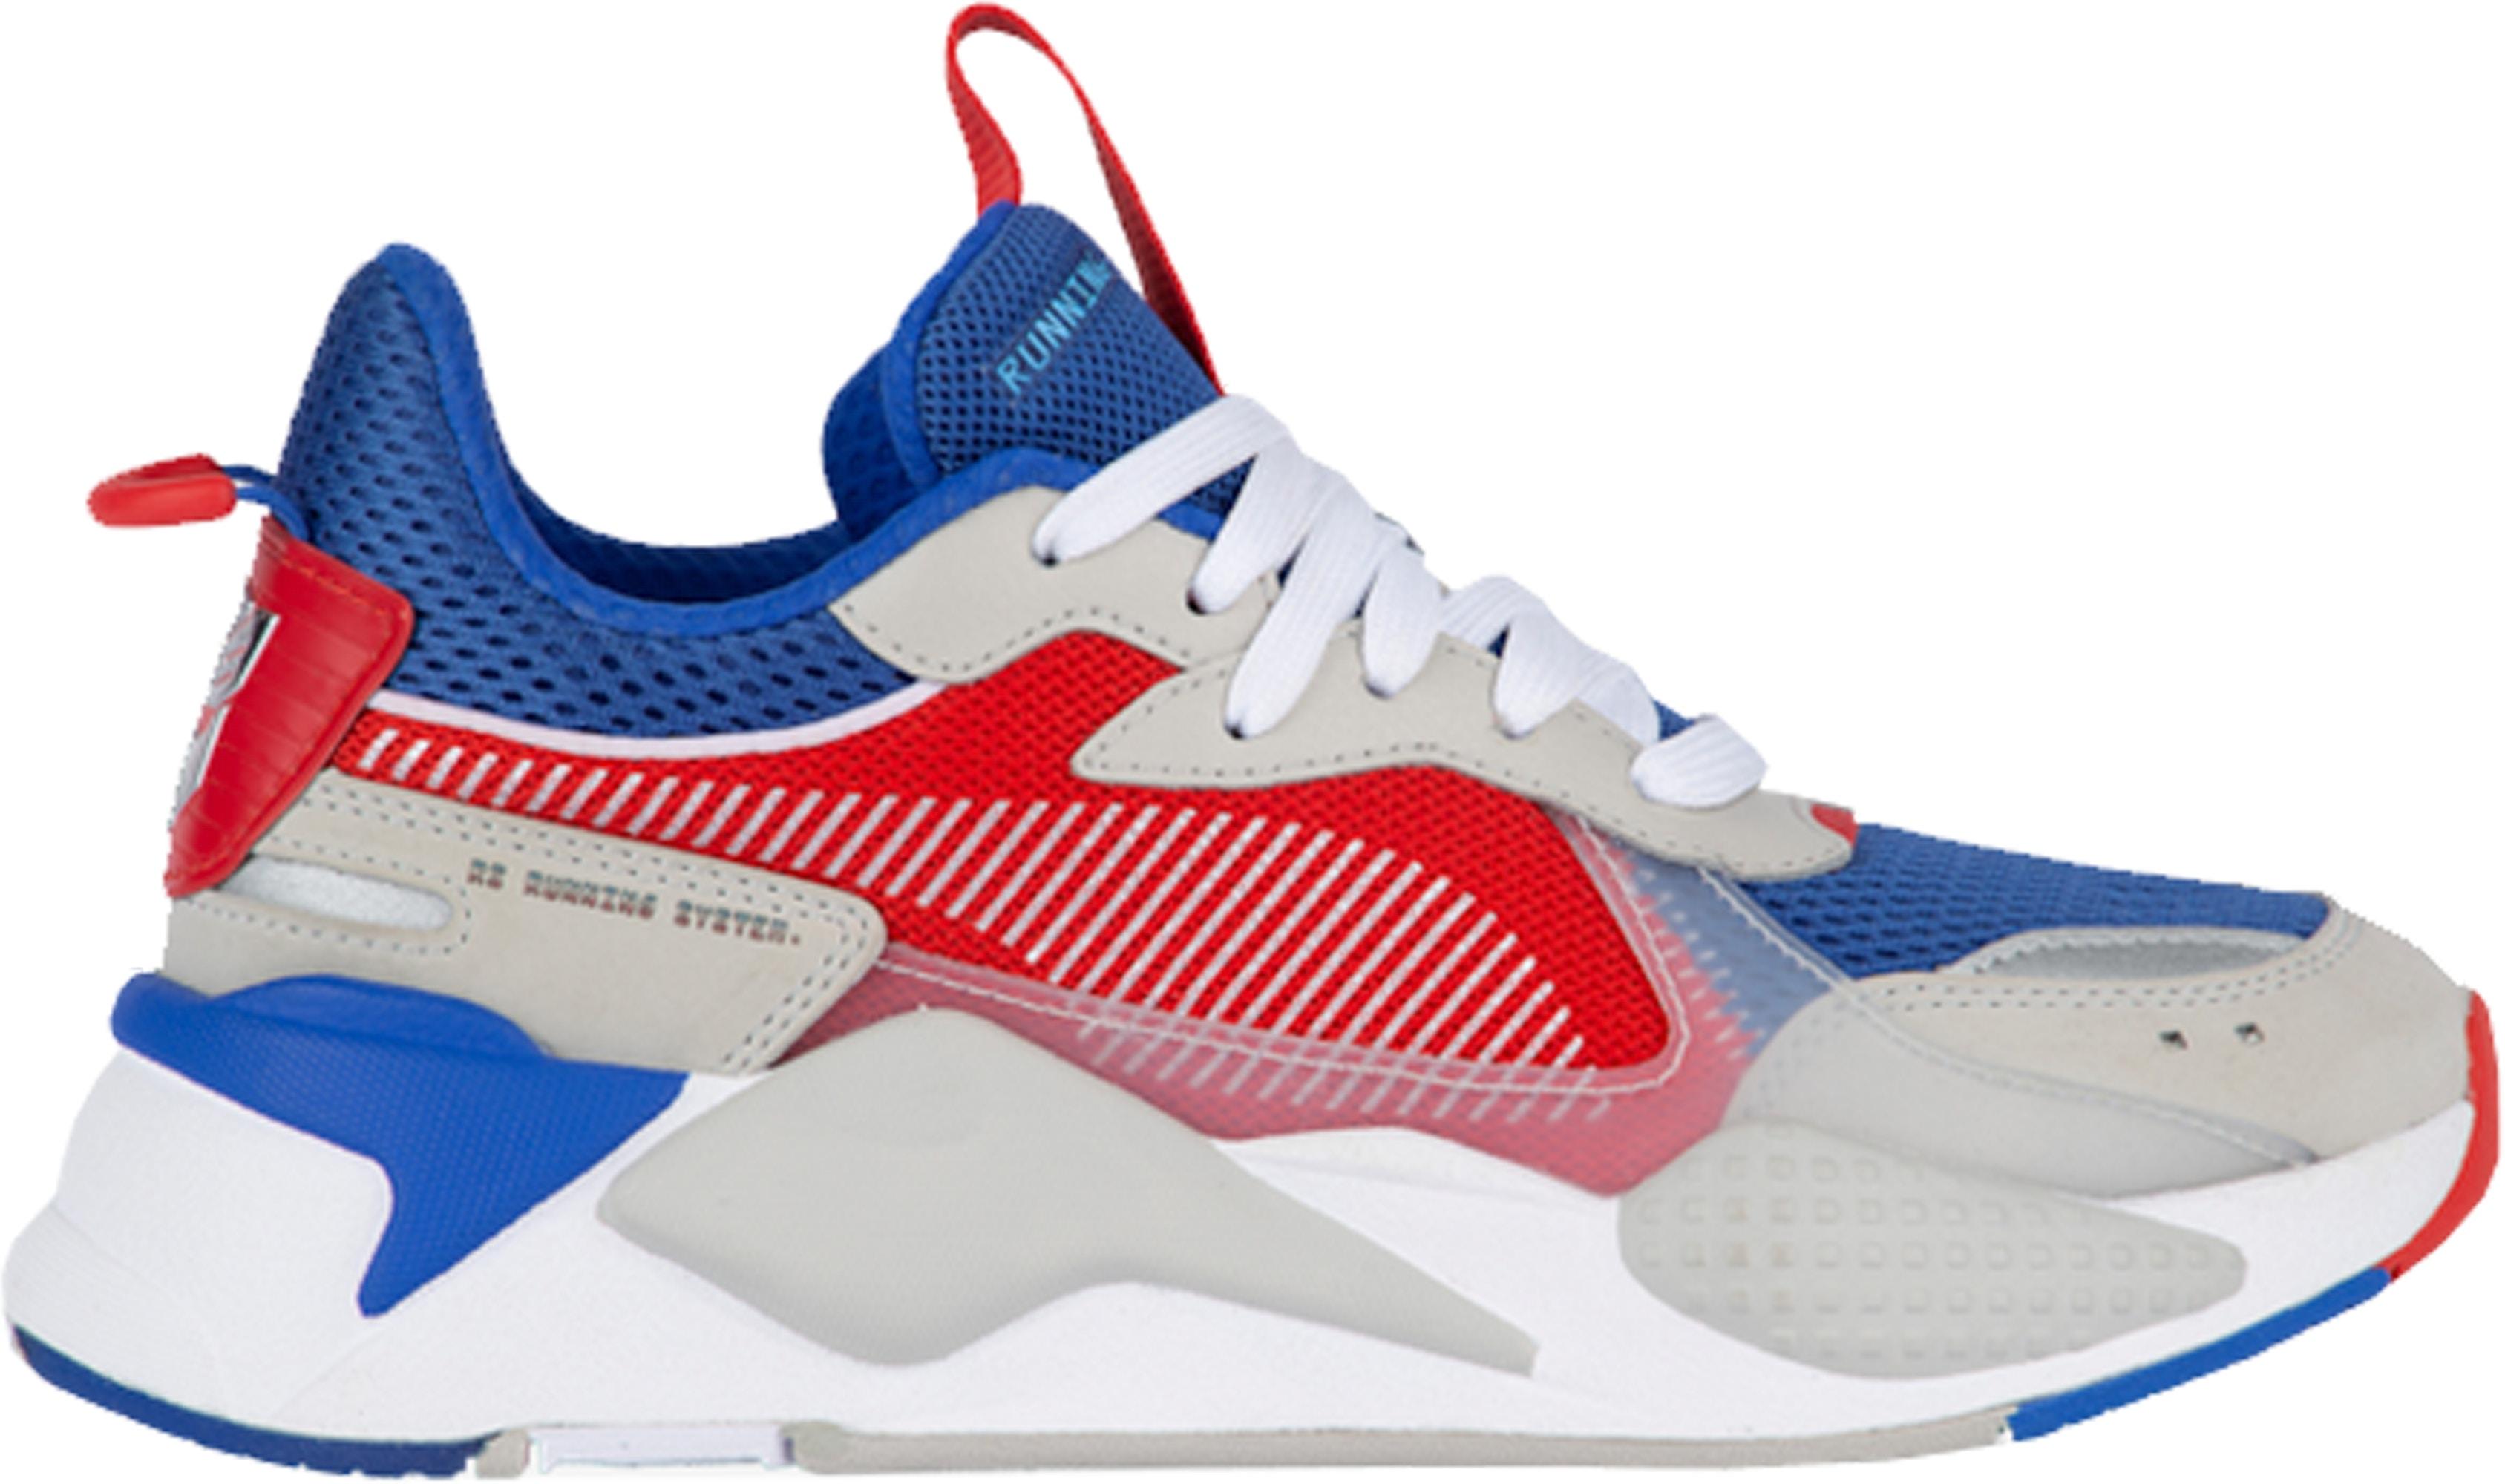 Buy PUMA - Mens Rs-X Colour Theory Shoe, Size: 12 D(M) US